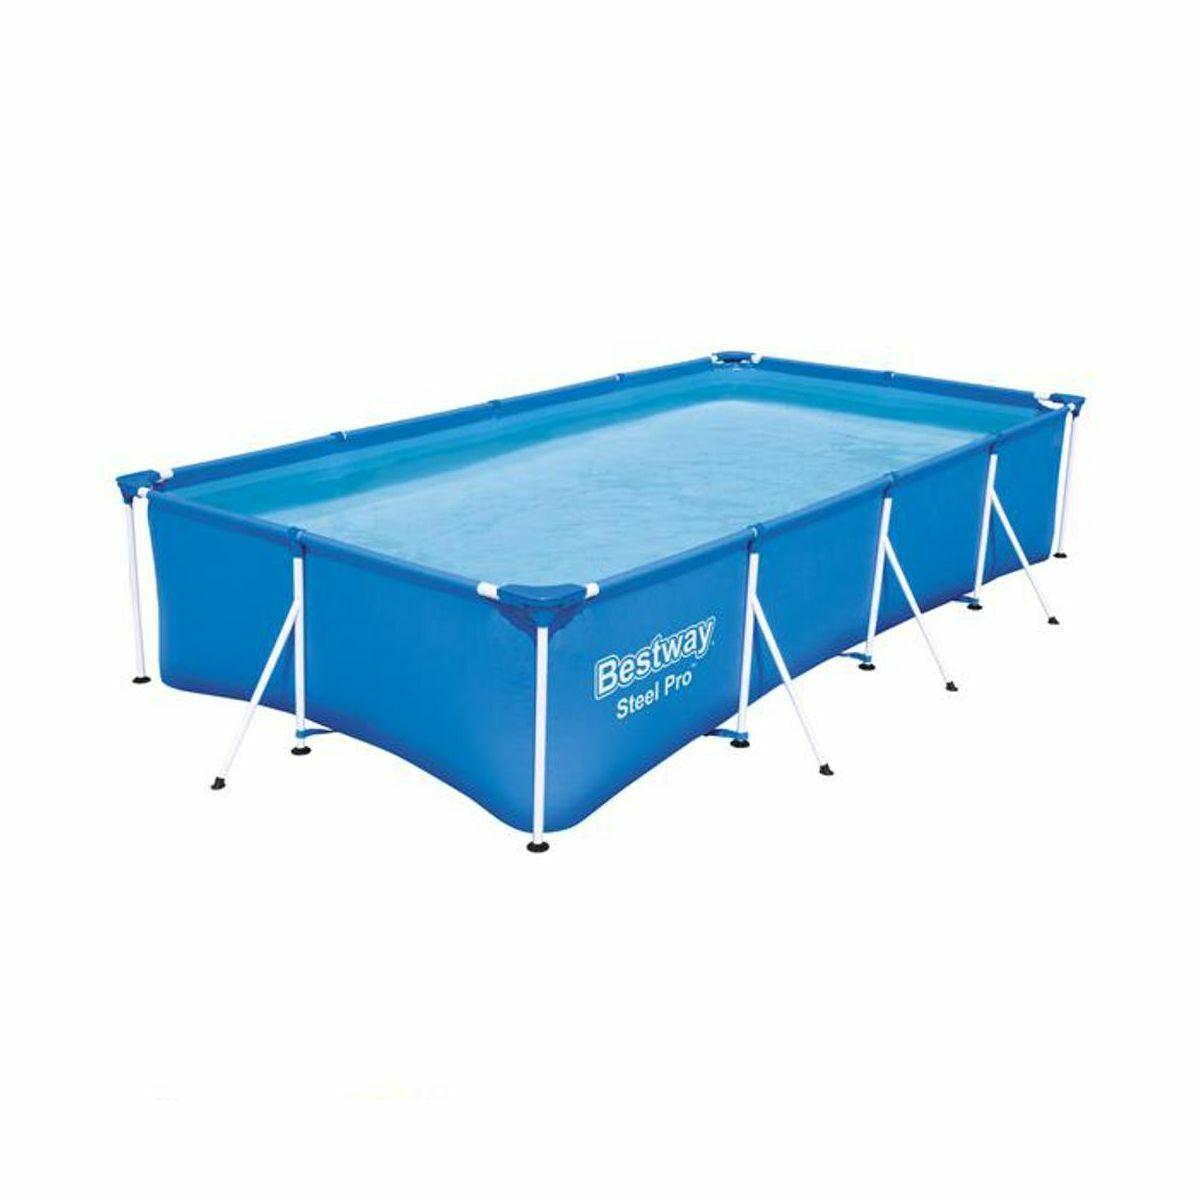 Bestway 56424 Steel Pro Frame Pool Set 13FT 400 x 211 x 81 cm Filter Pump